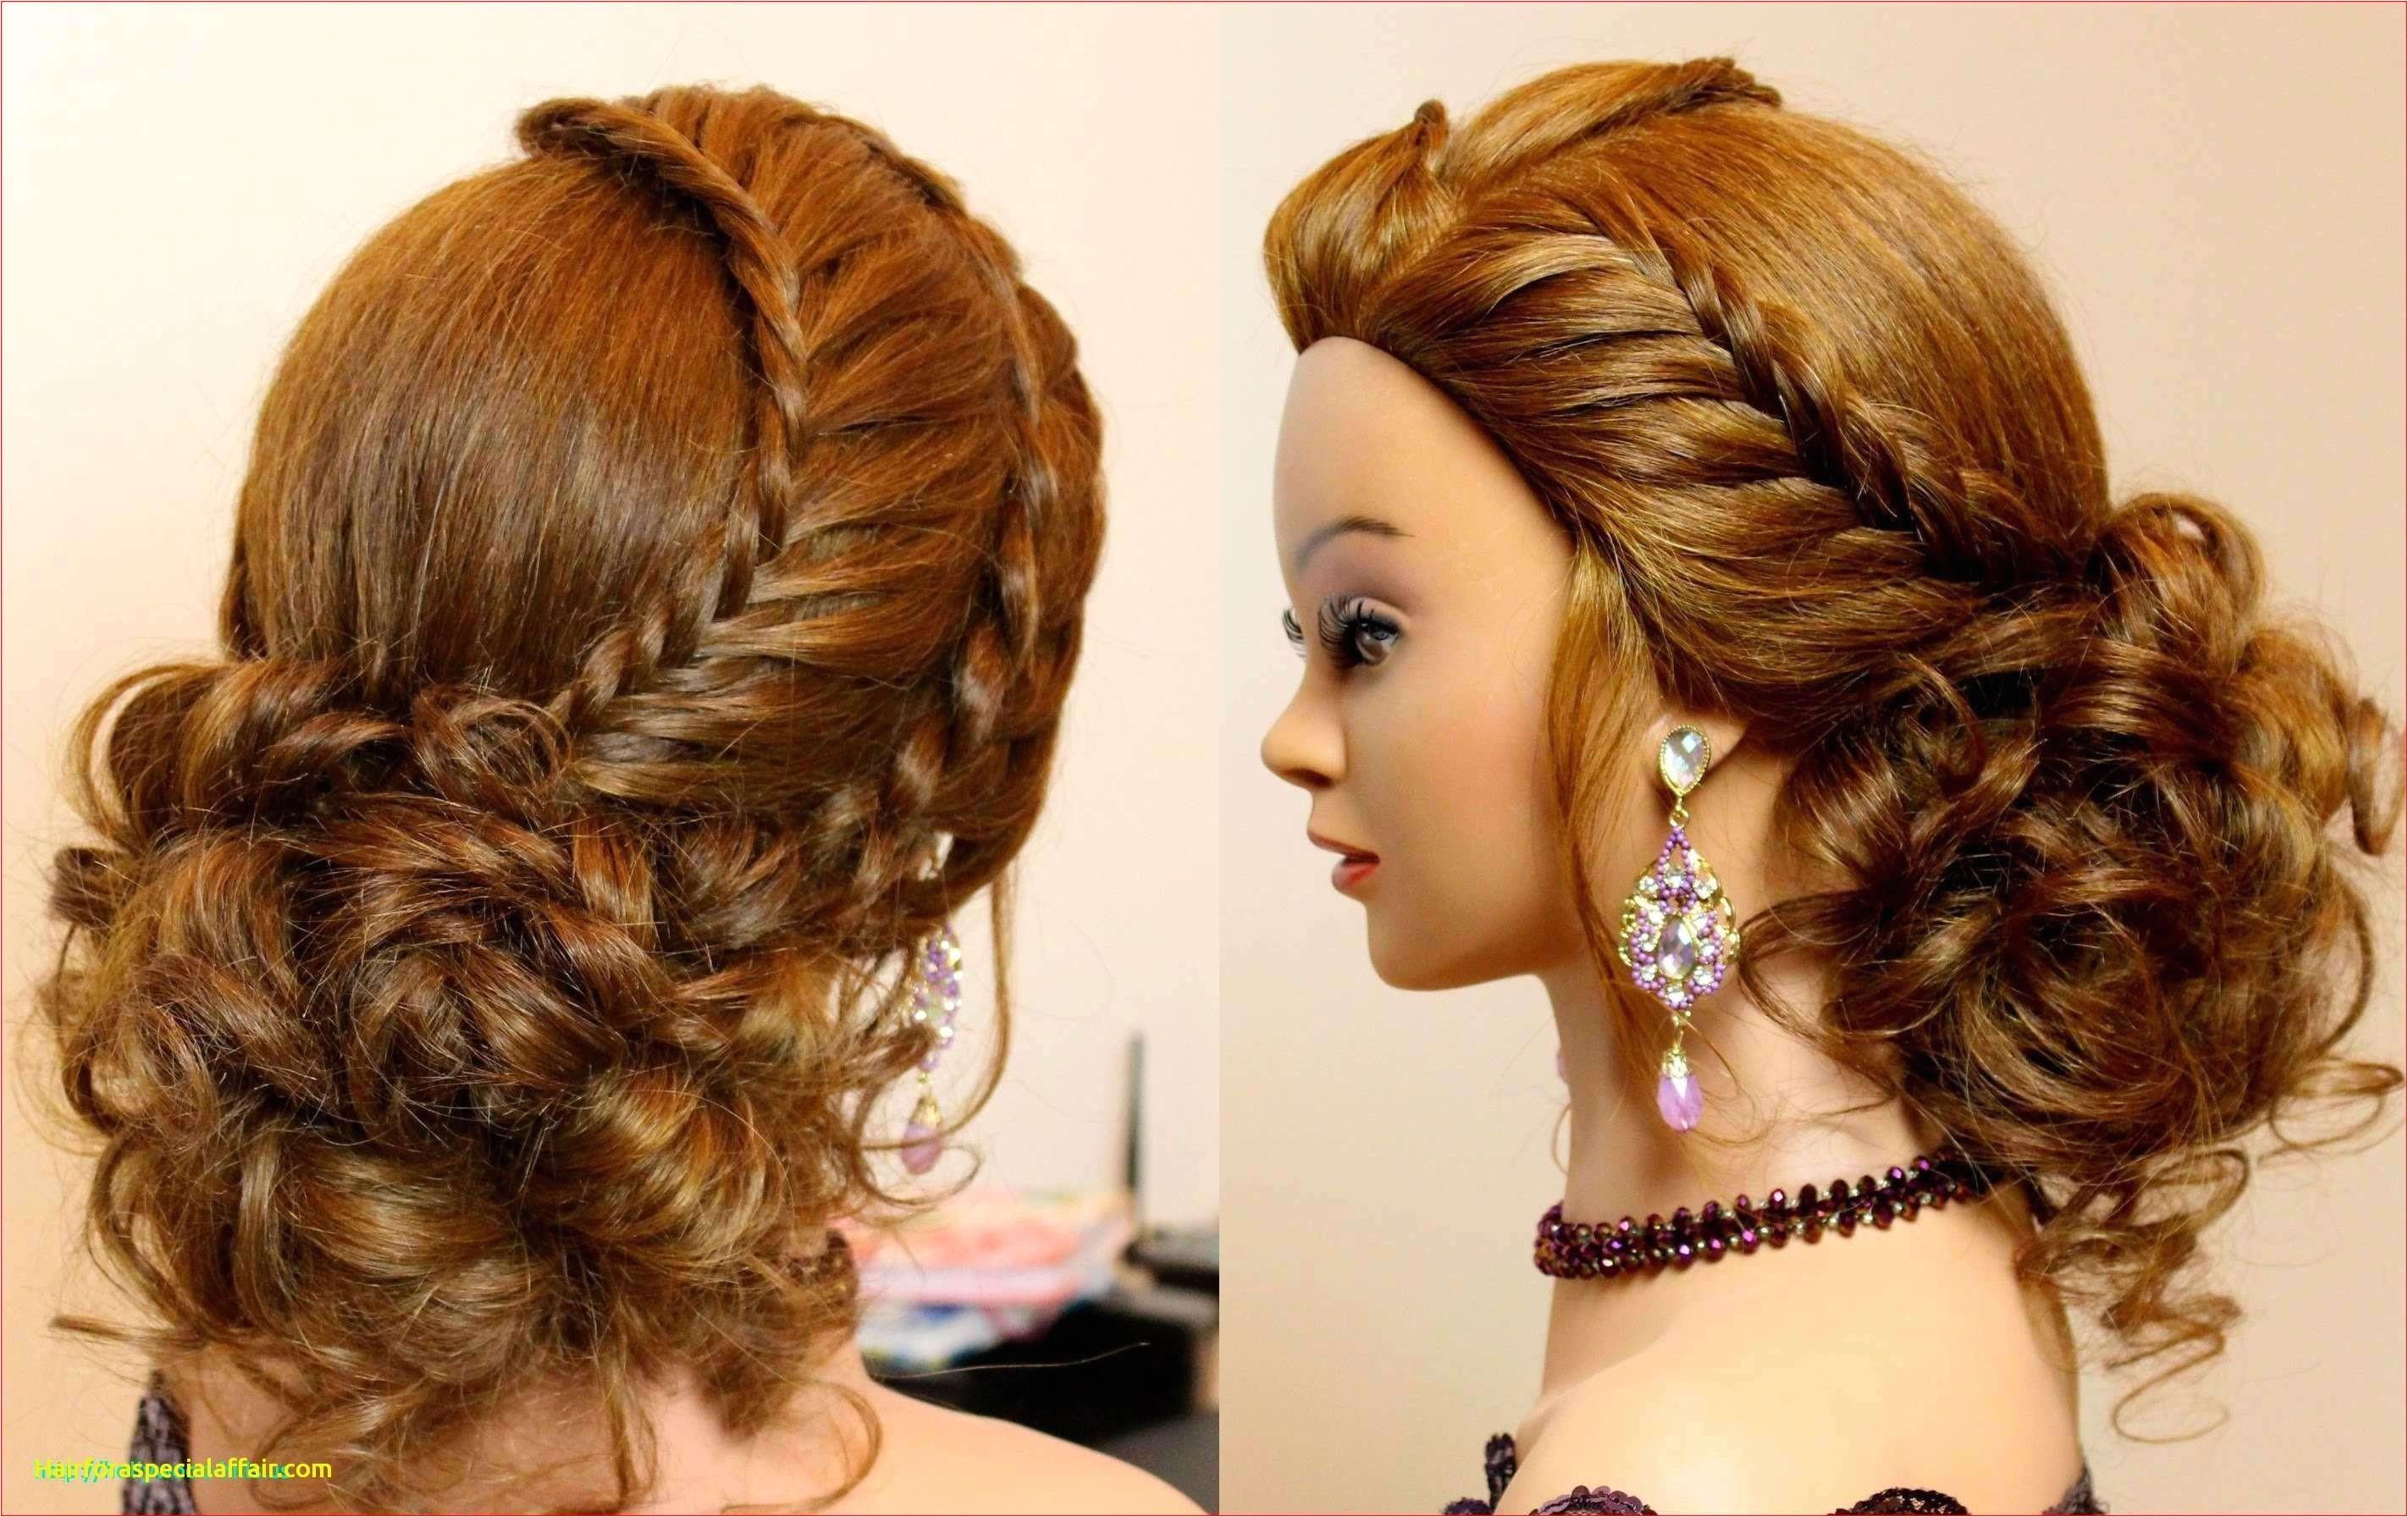 List Girl Hairstyles Beautiful Fresh Cute Haircuts Long Hair List Girl Hairstyles Luxury